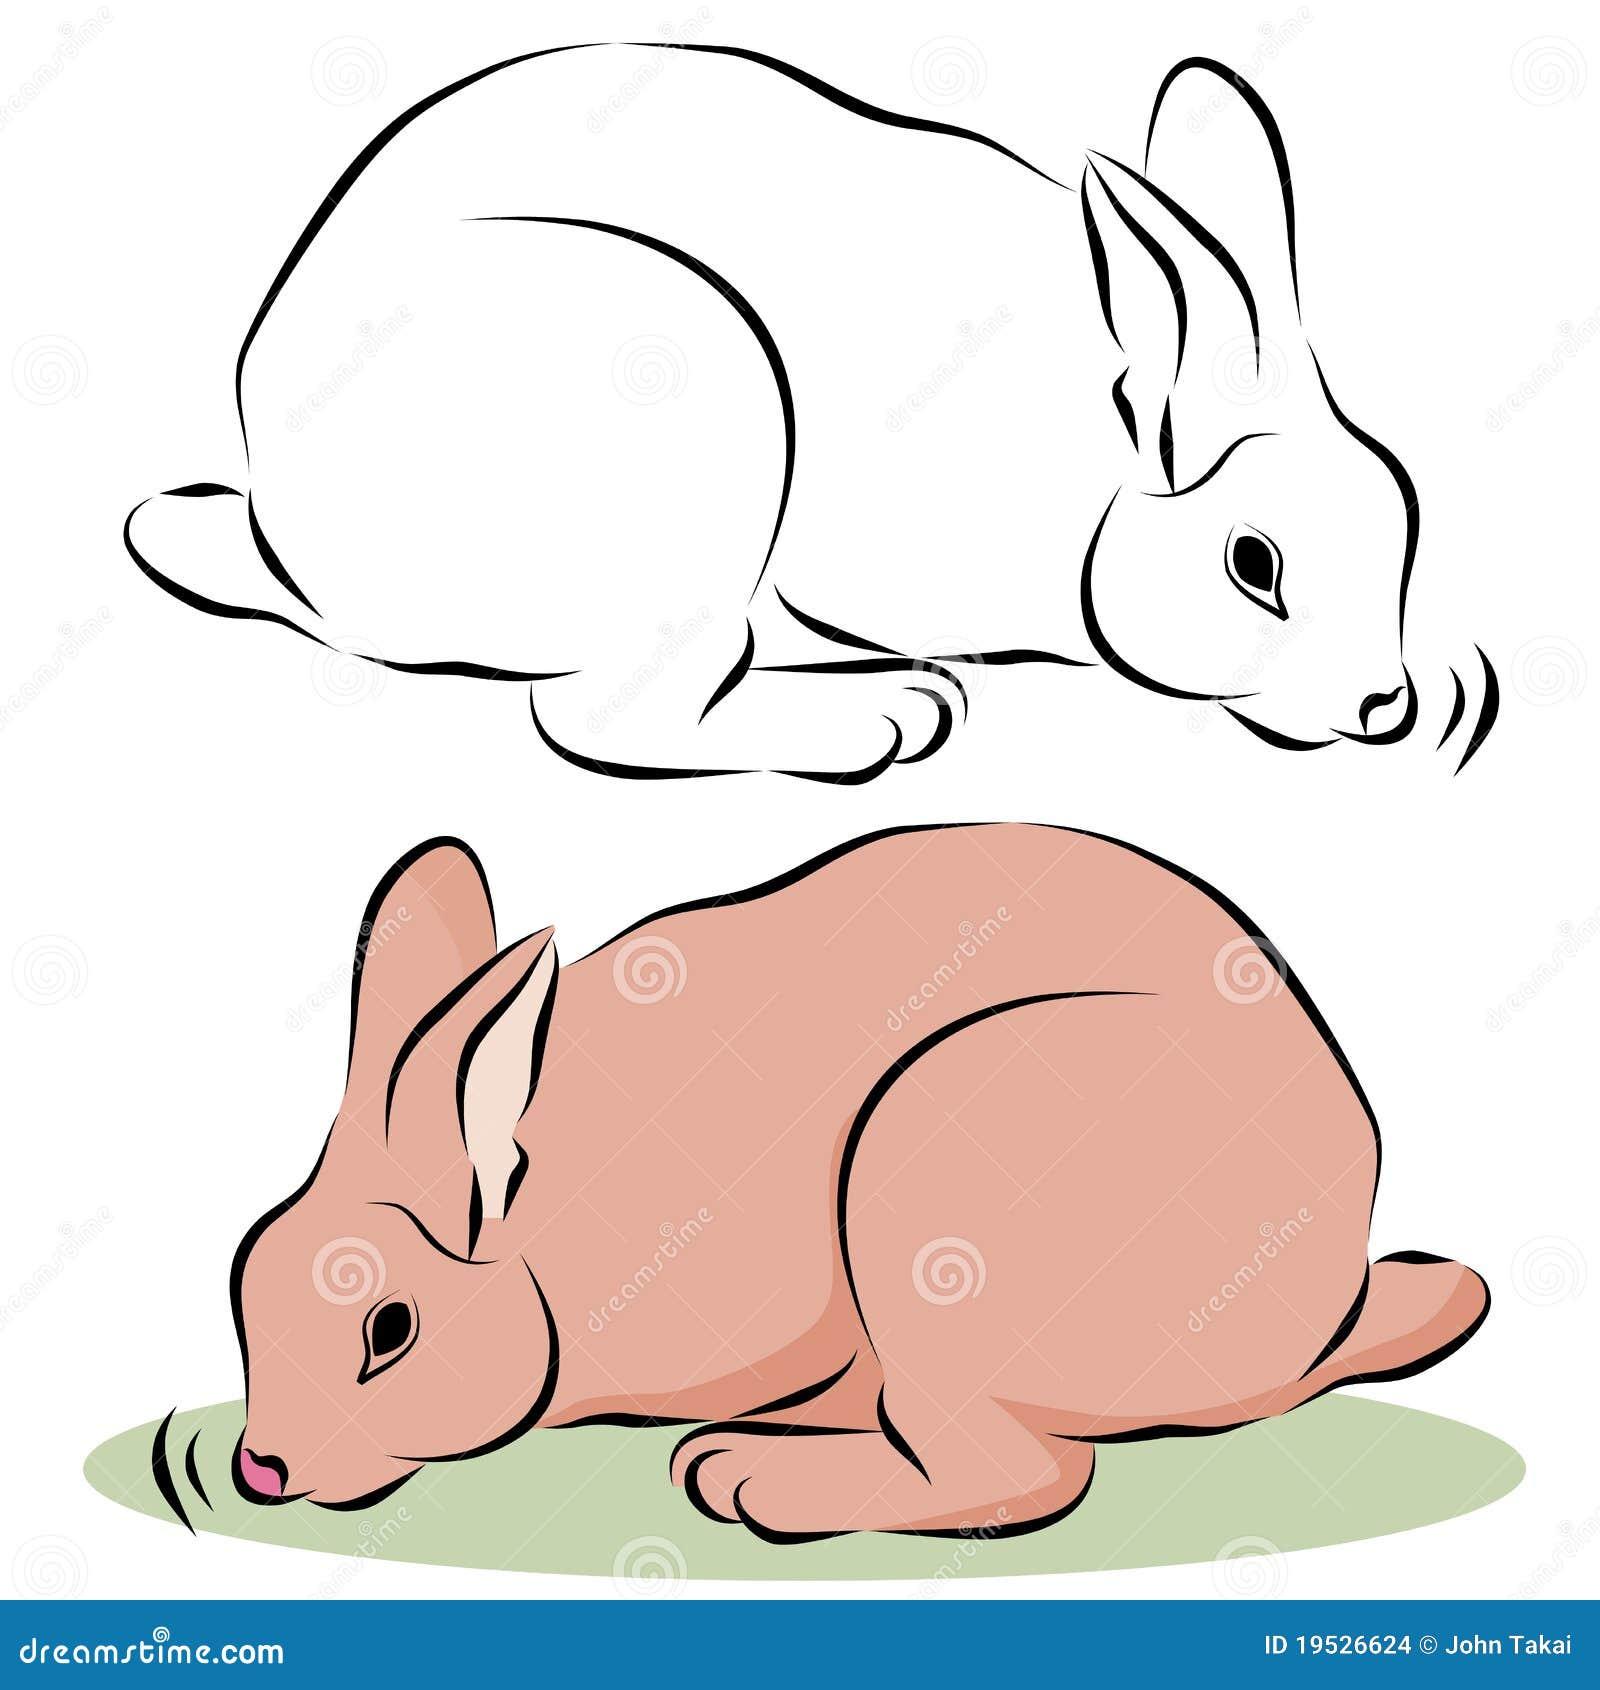 bunny rabbit sniffing around - photo #33